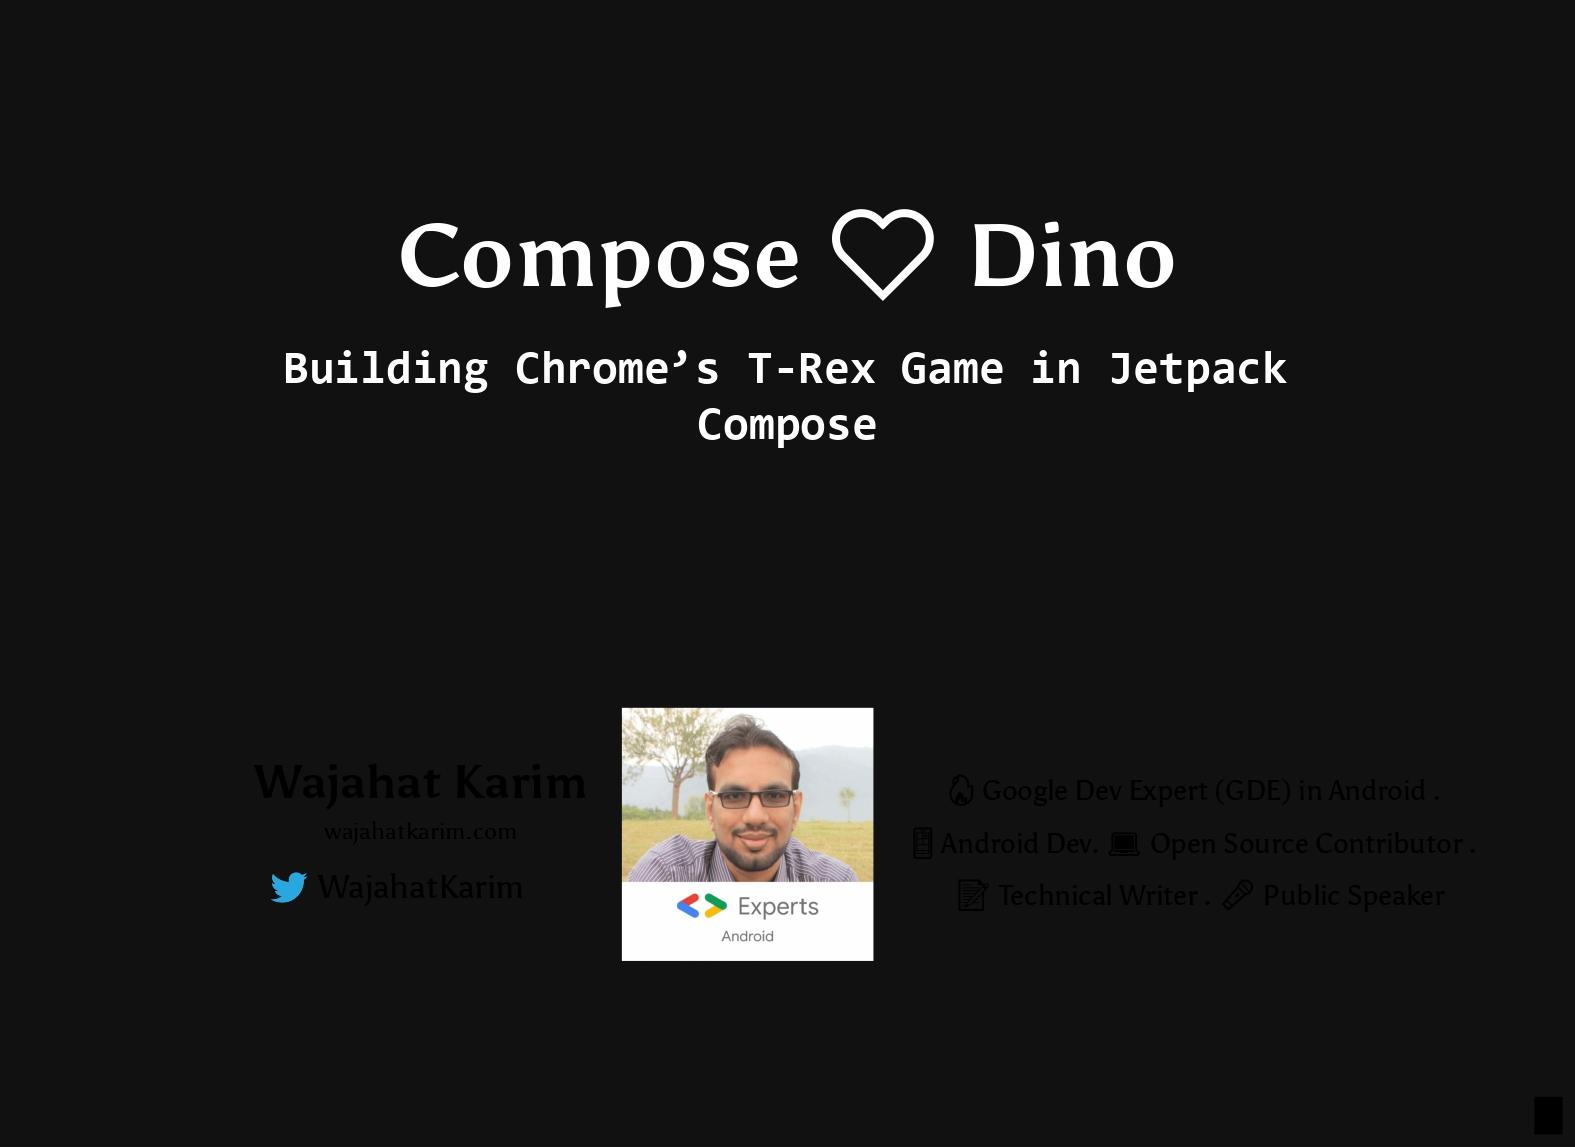 Compose ❤️ Dino: Building Chrome's T-Rex Game in Jetpack Compose - Kotlin Mumba